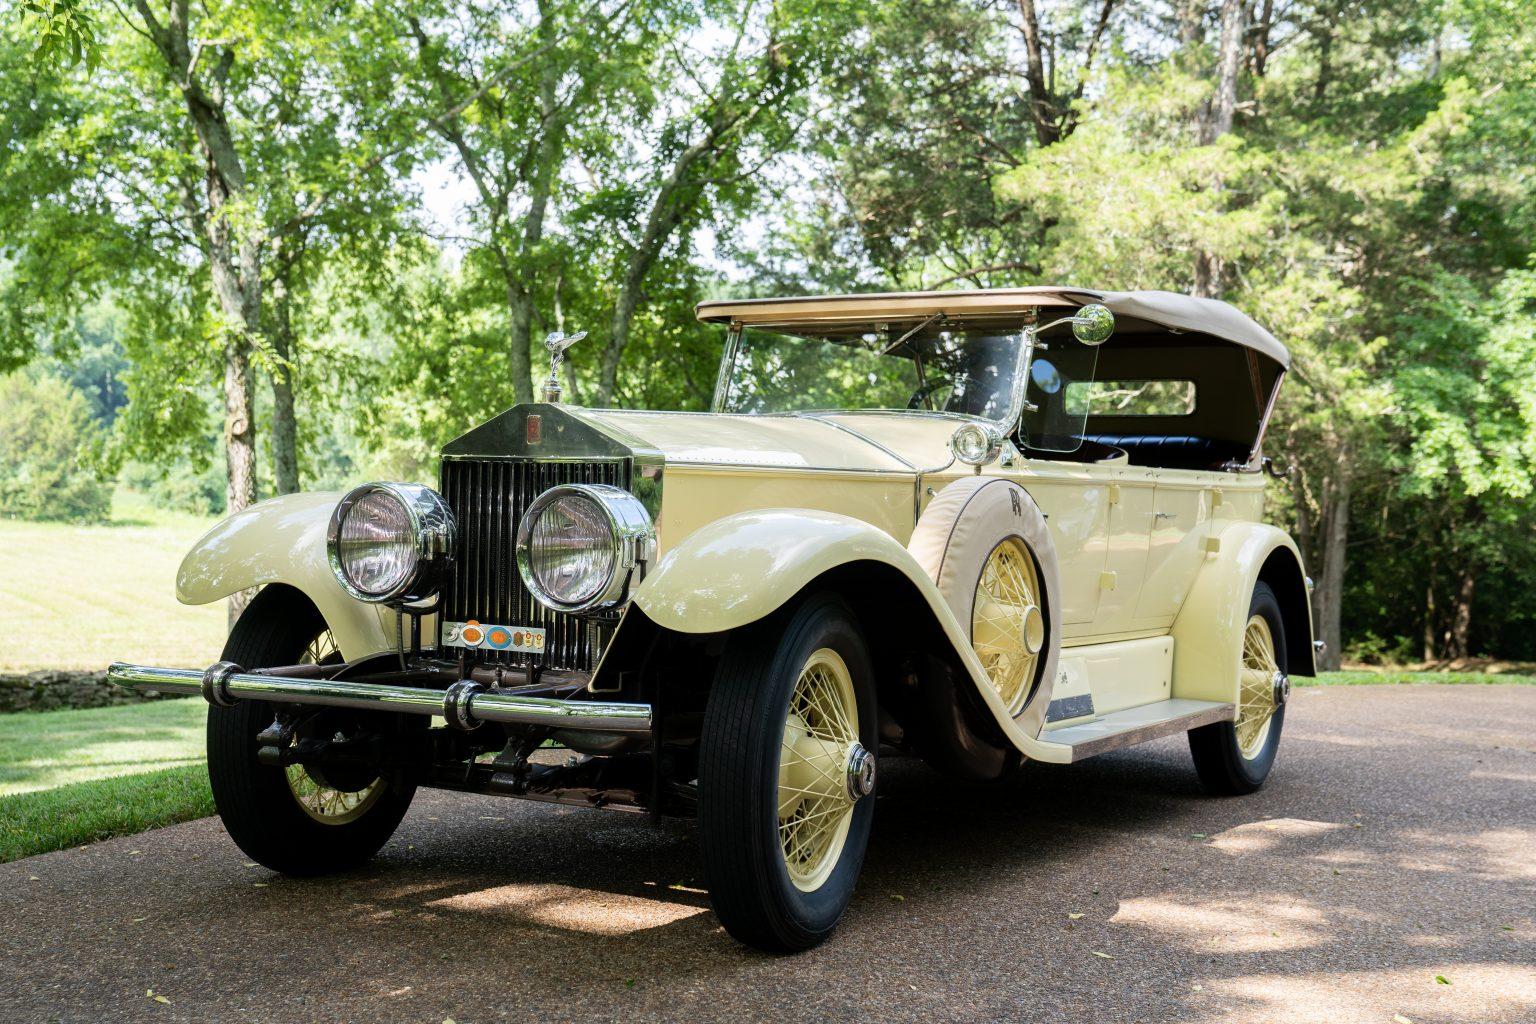 A classic car at the Cheekwood Classic. Car Show in Nashville, TN